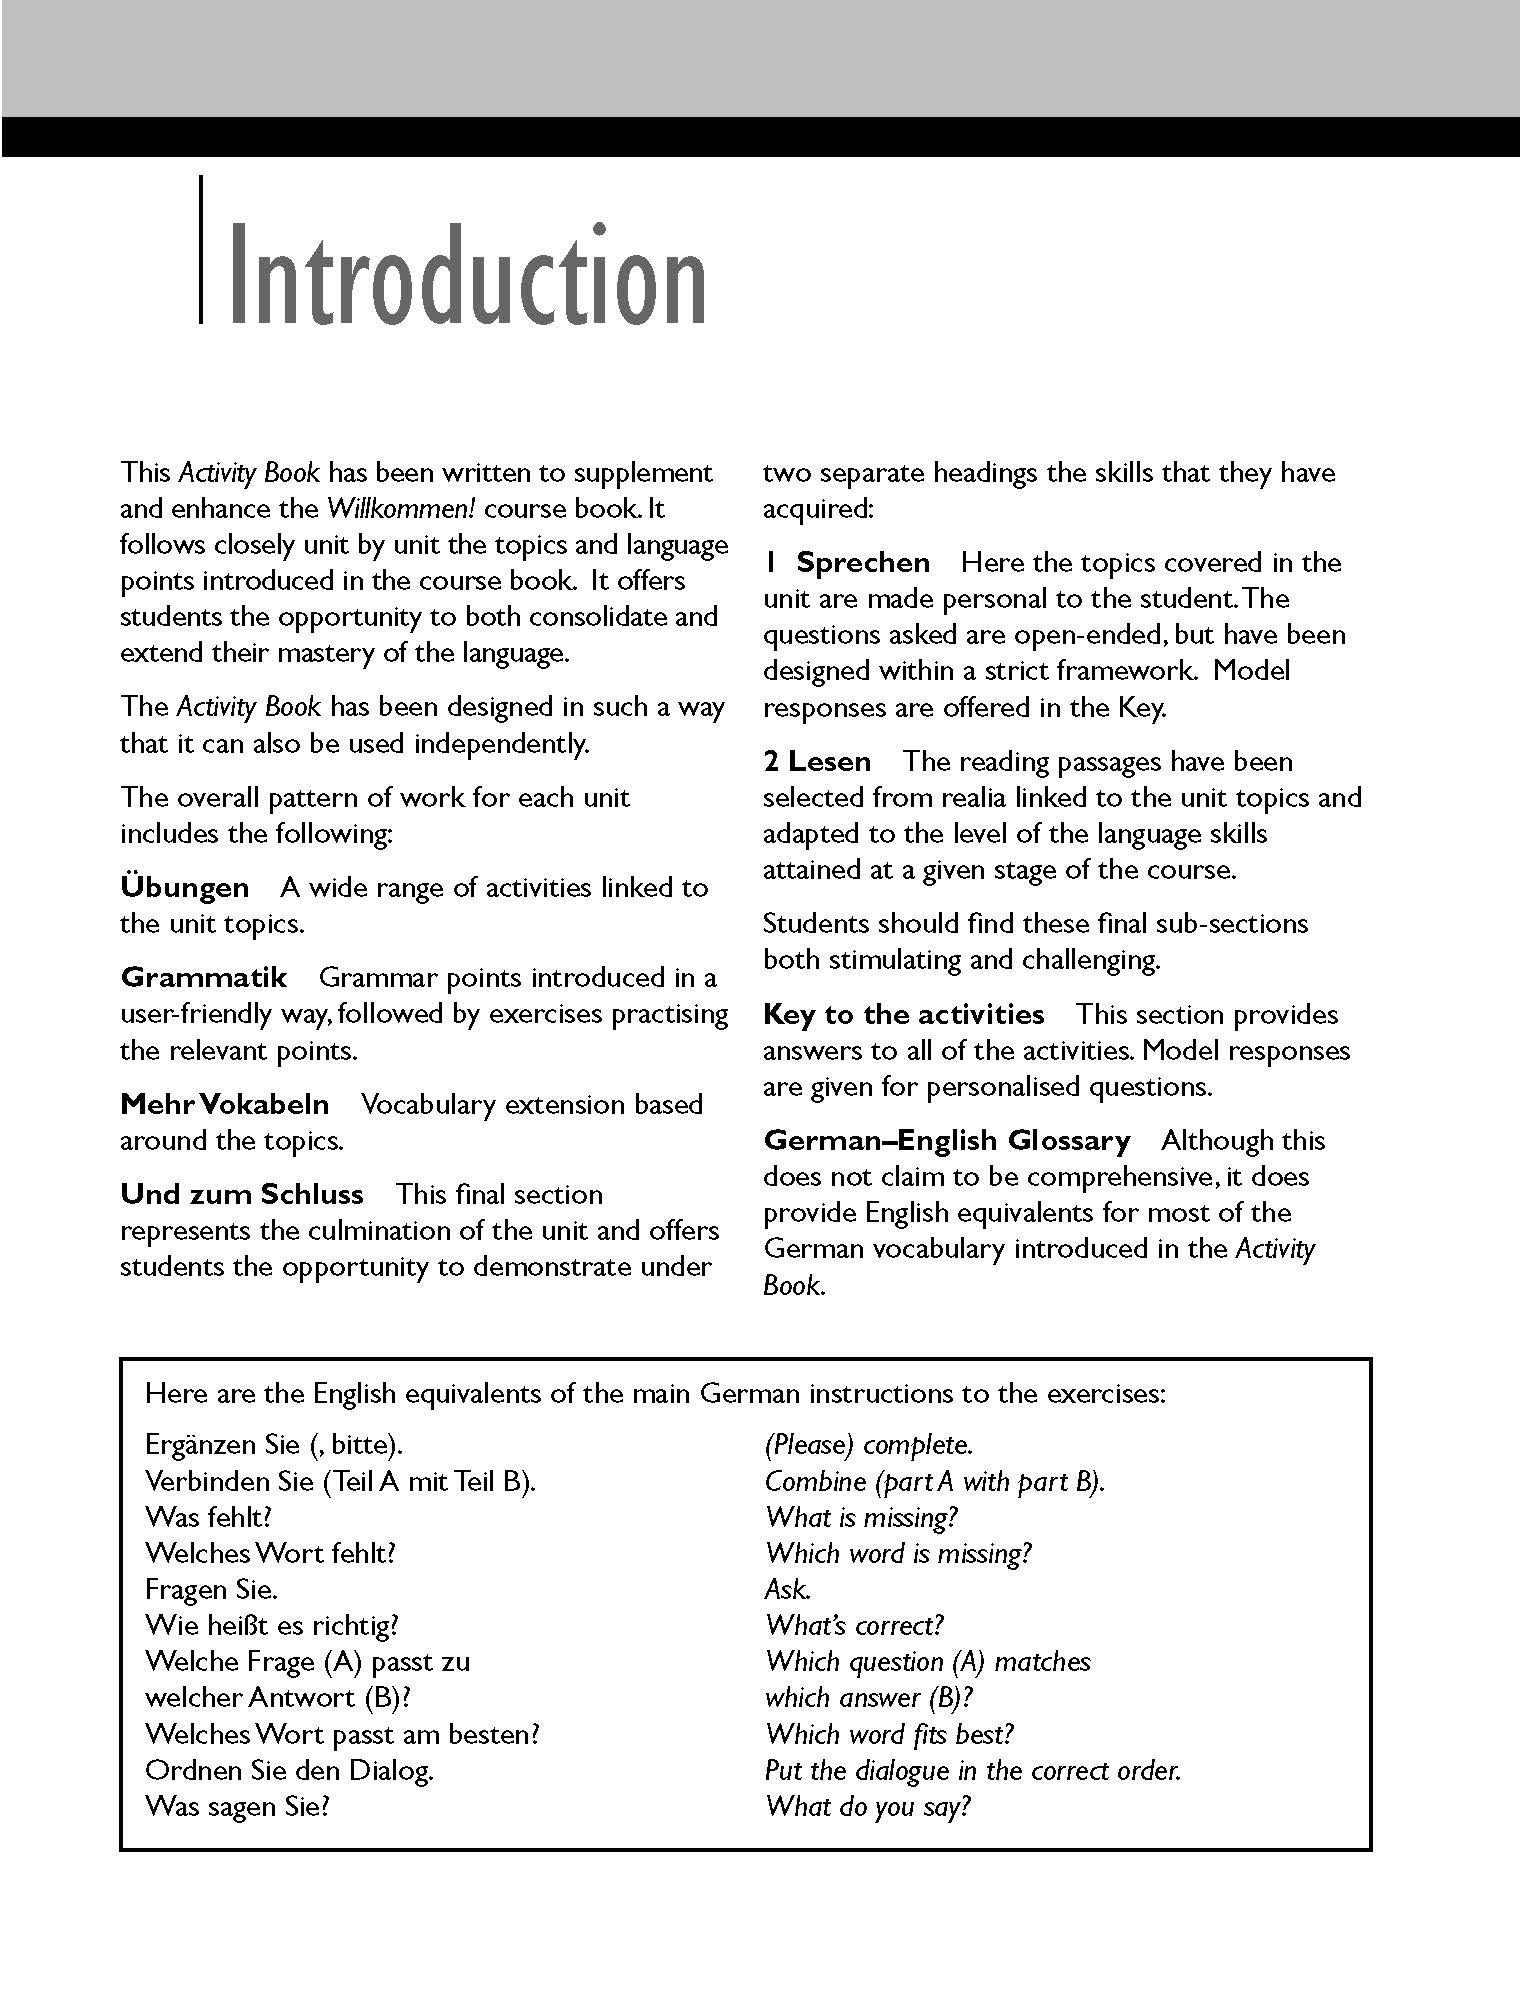 Willkommen! German Beginner's Course 2ED Revised: Activity Book:  Amazon.co.uk: Paul Coggle, Heiner Schenke: 9781444165180: Books